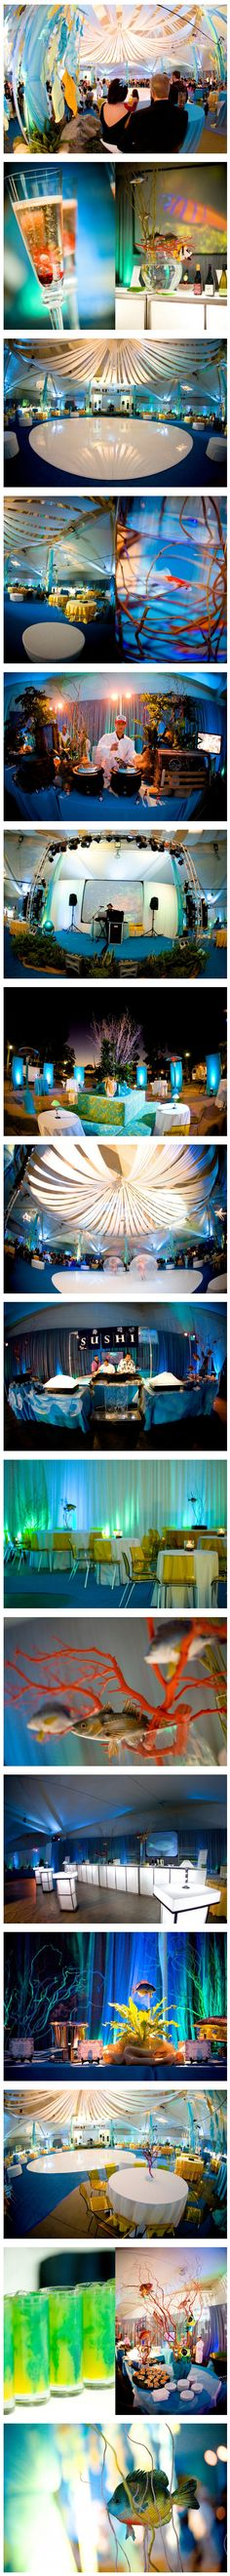 Earl Warren Showgrounds | Under the Sea Corporate Event | Alegria by Design | alegriabydesign.com